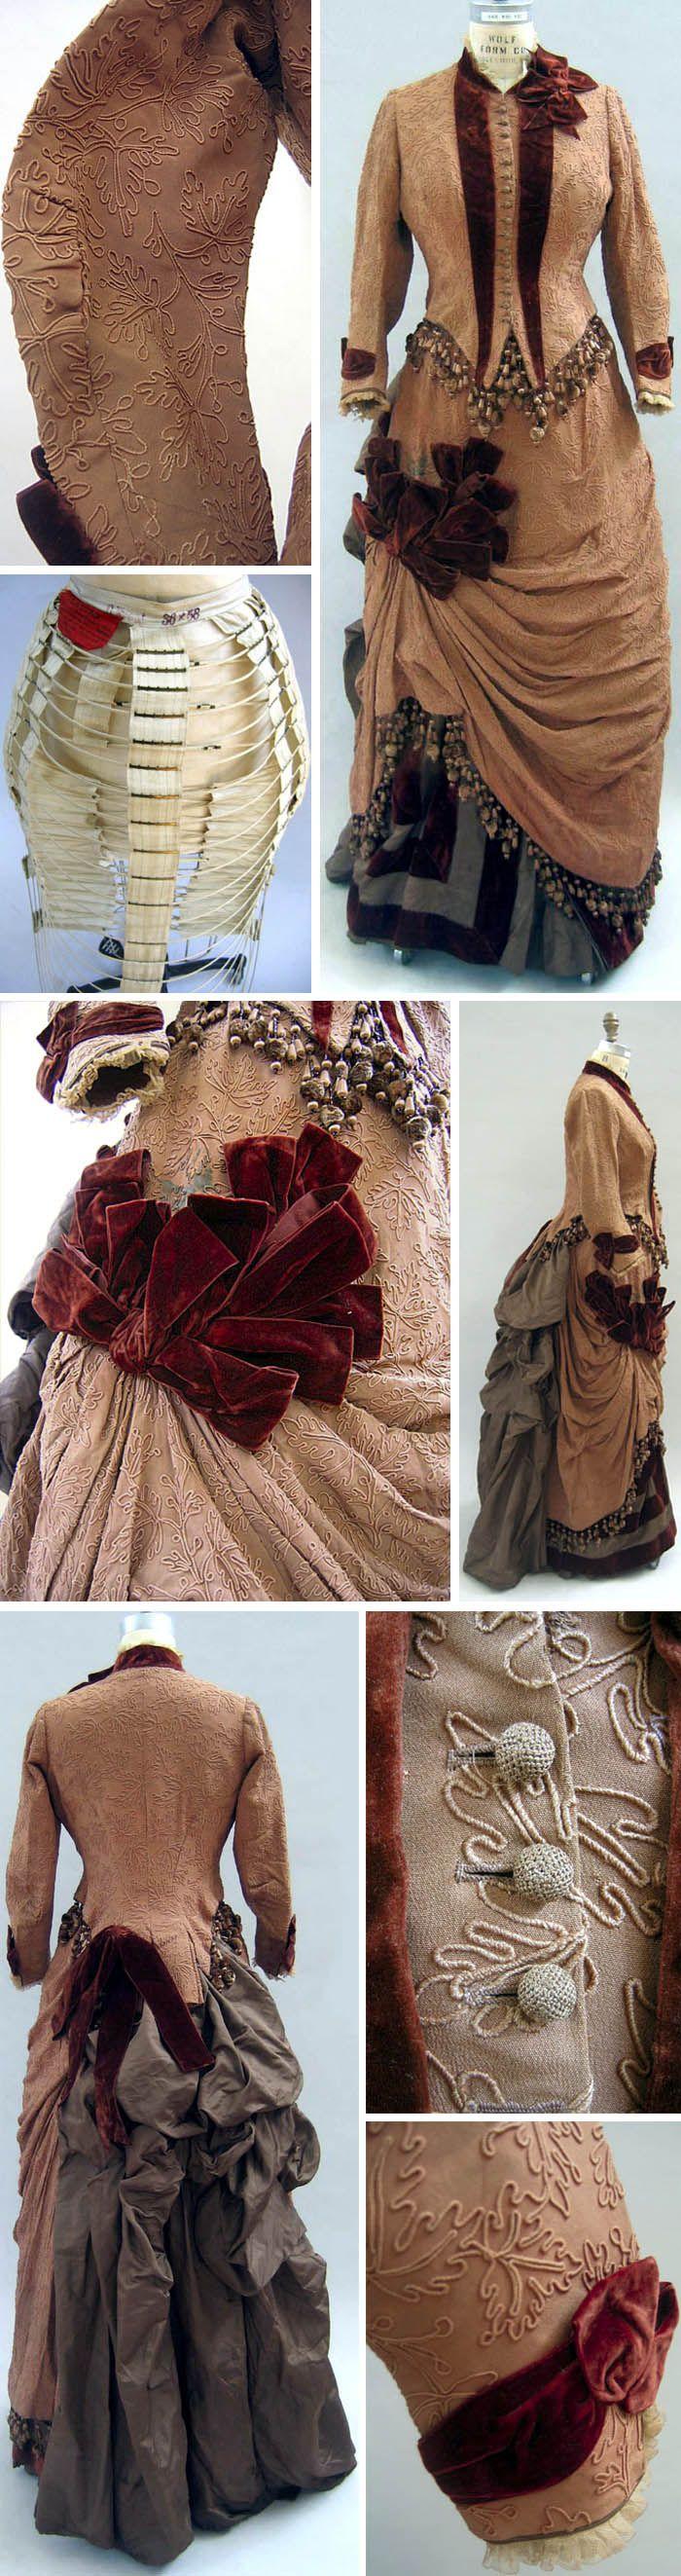 best historical dress images on pinterest vintage clothing